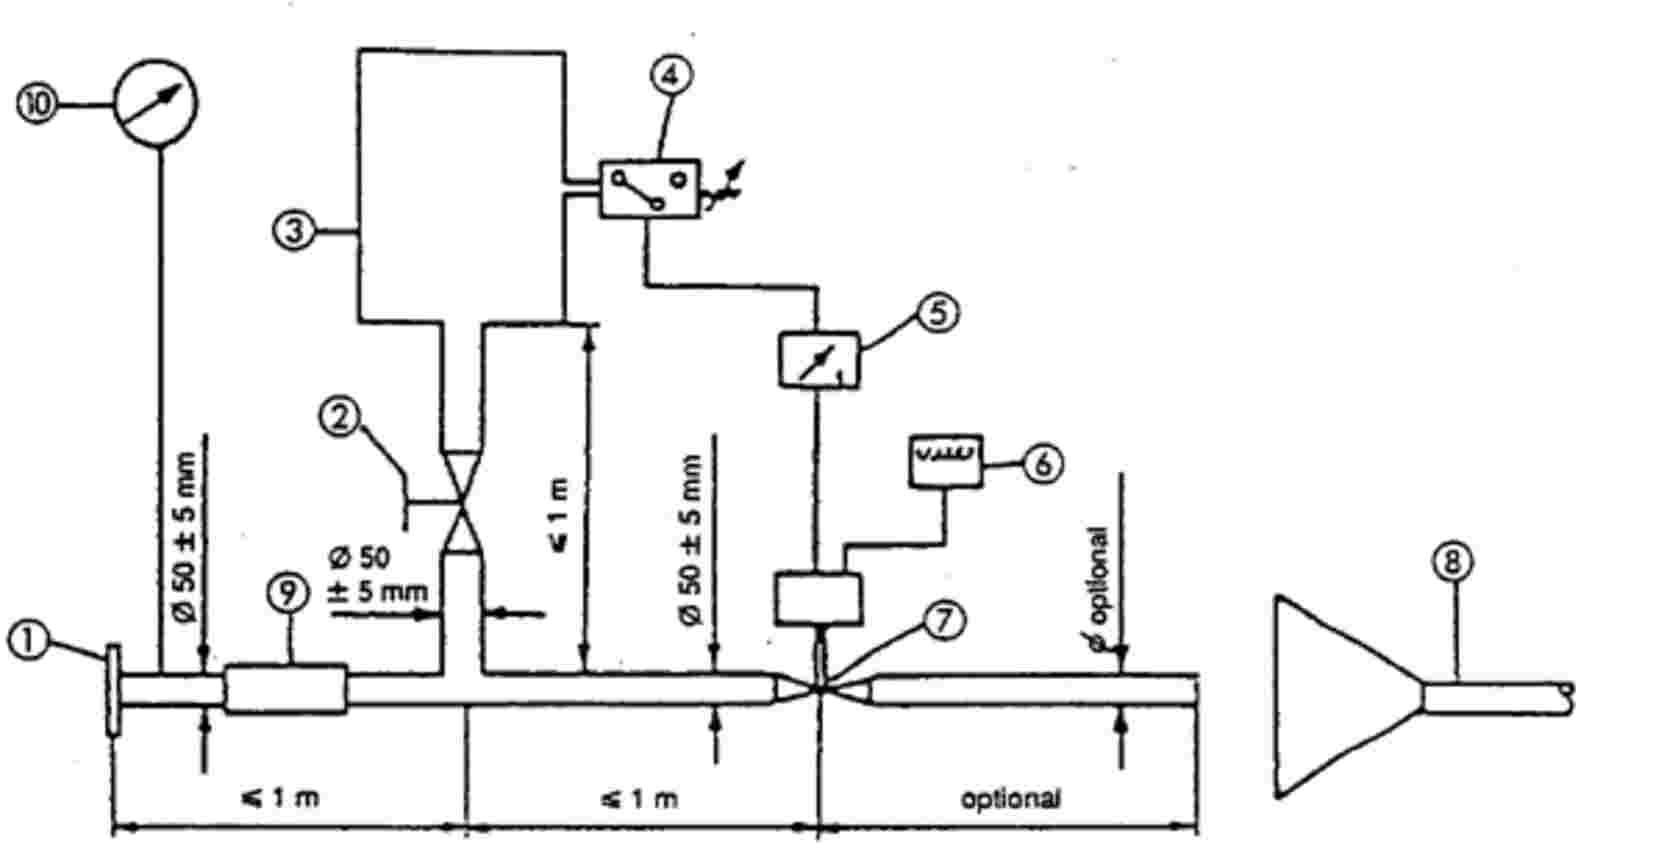 Eur Lex 32014r0540 En Schematic For Sound Level Meter Image